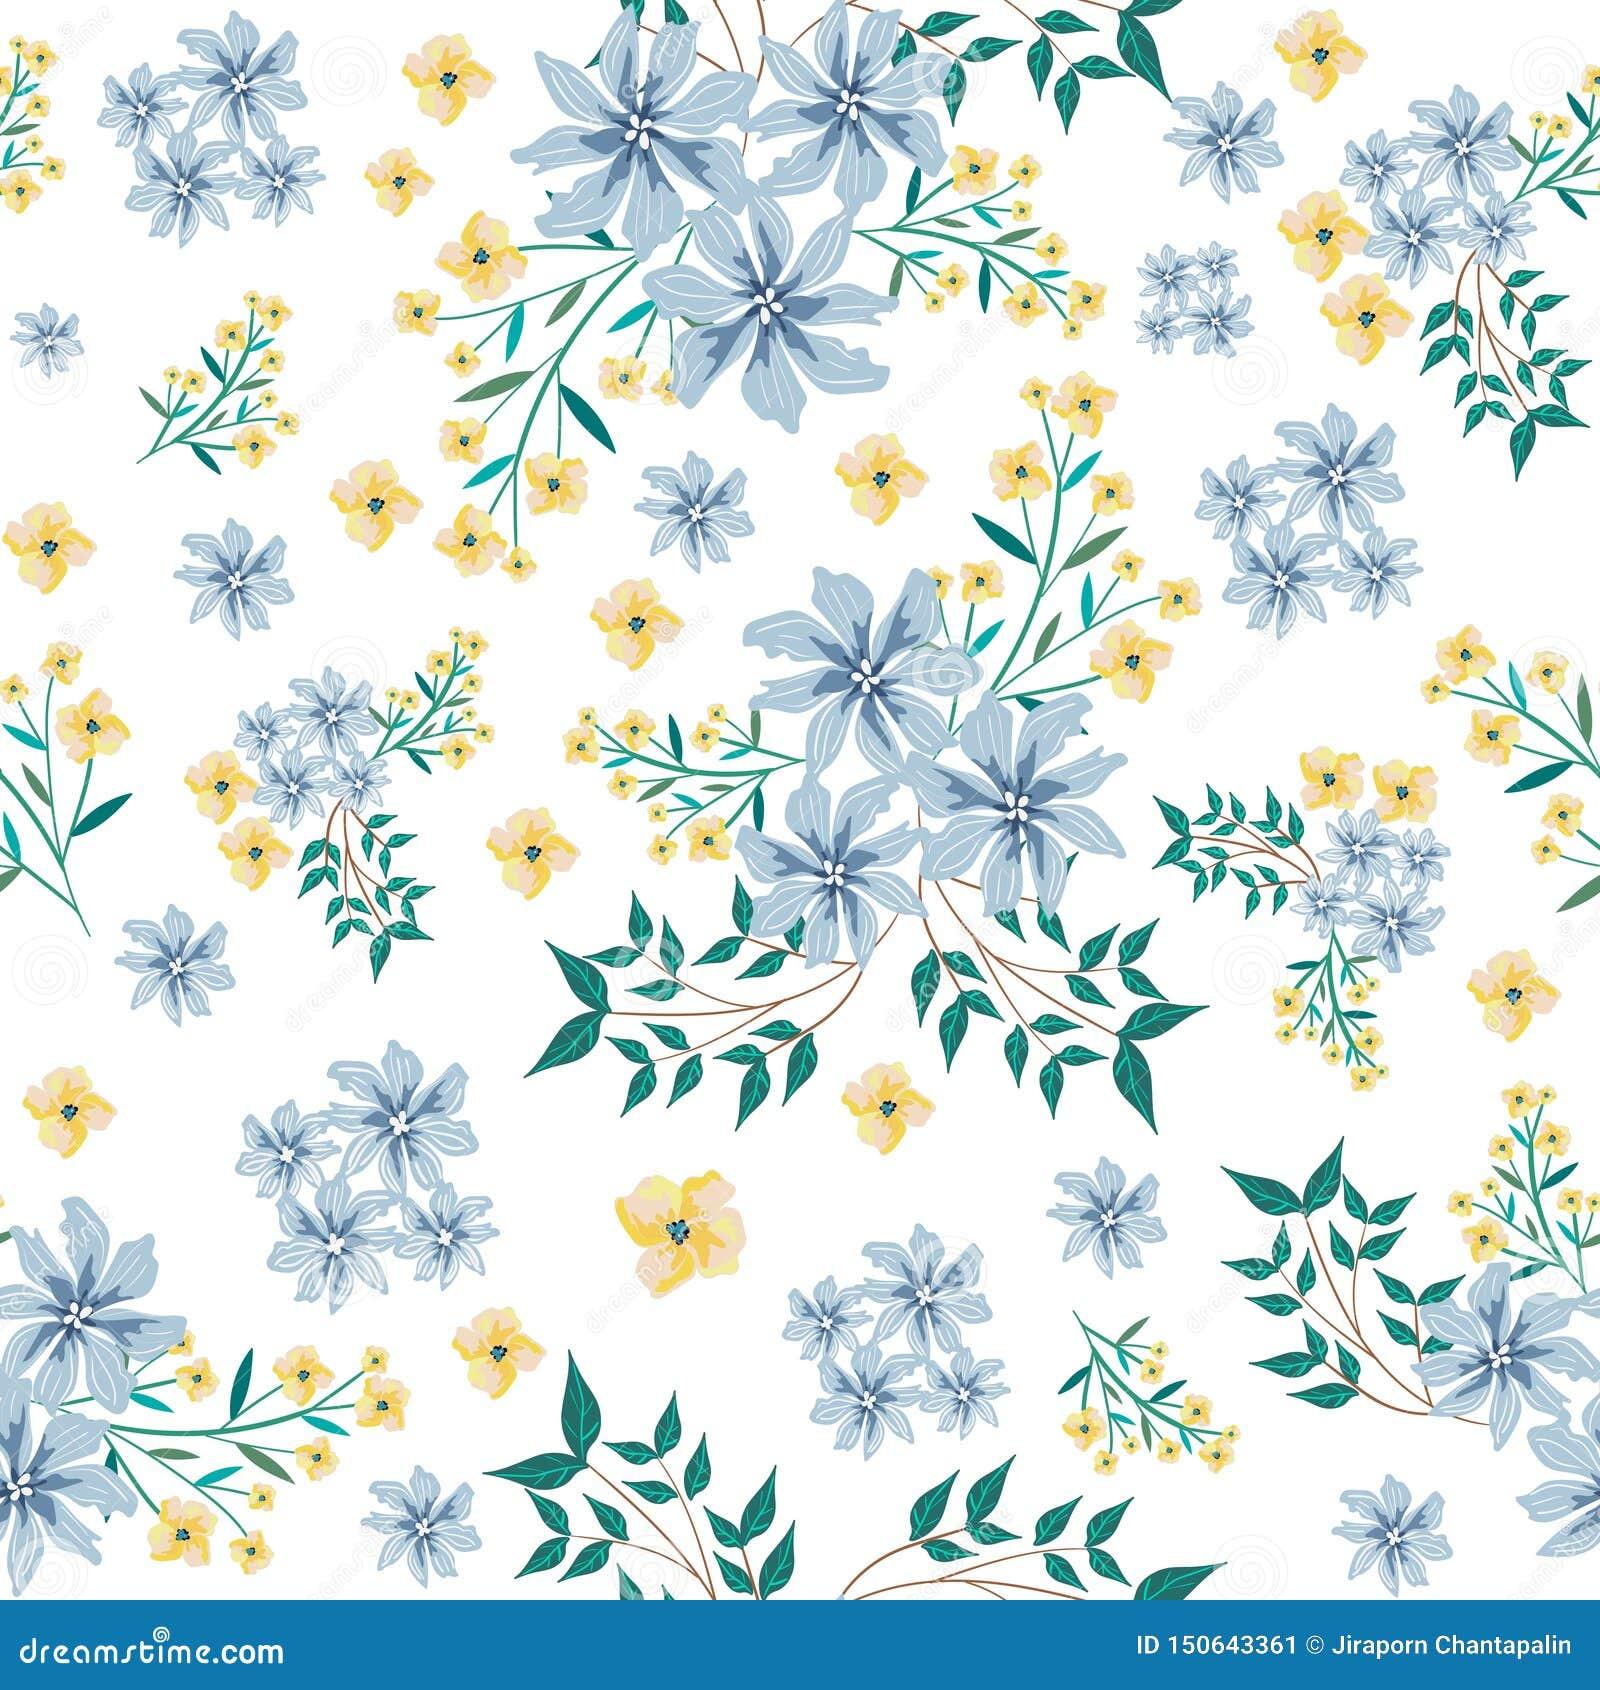 Blue and yellower flower seamless pattern